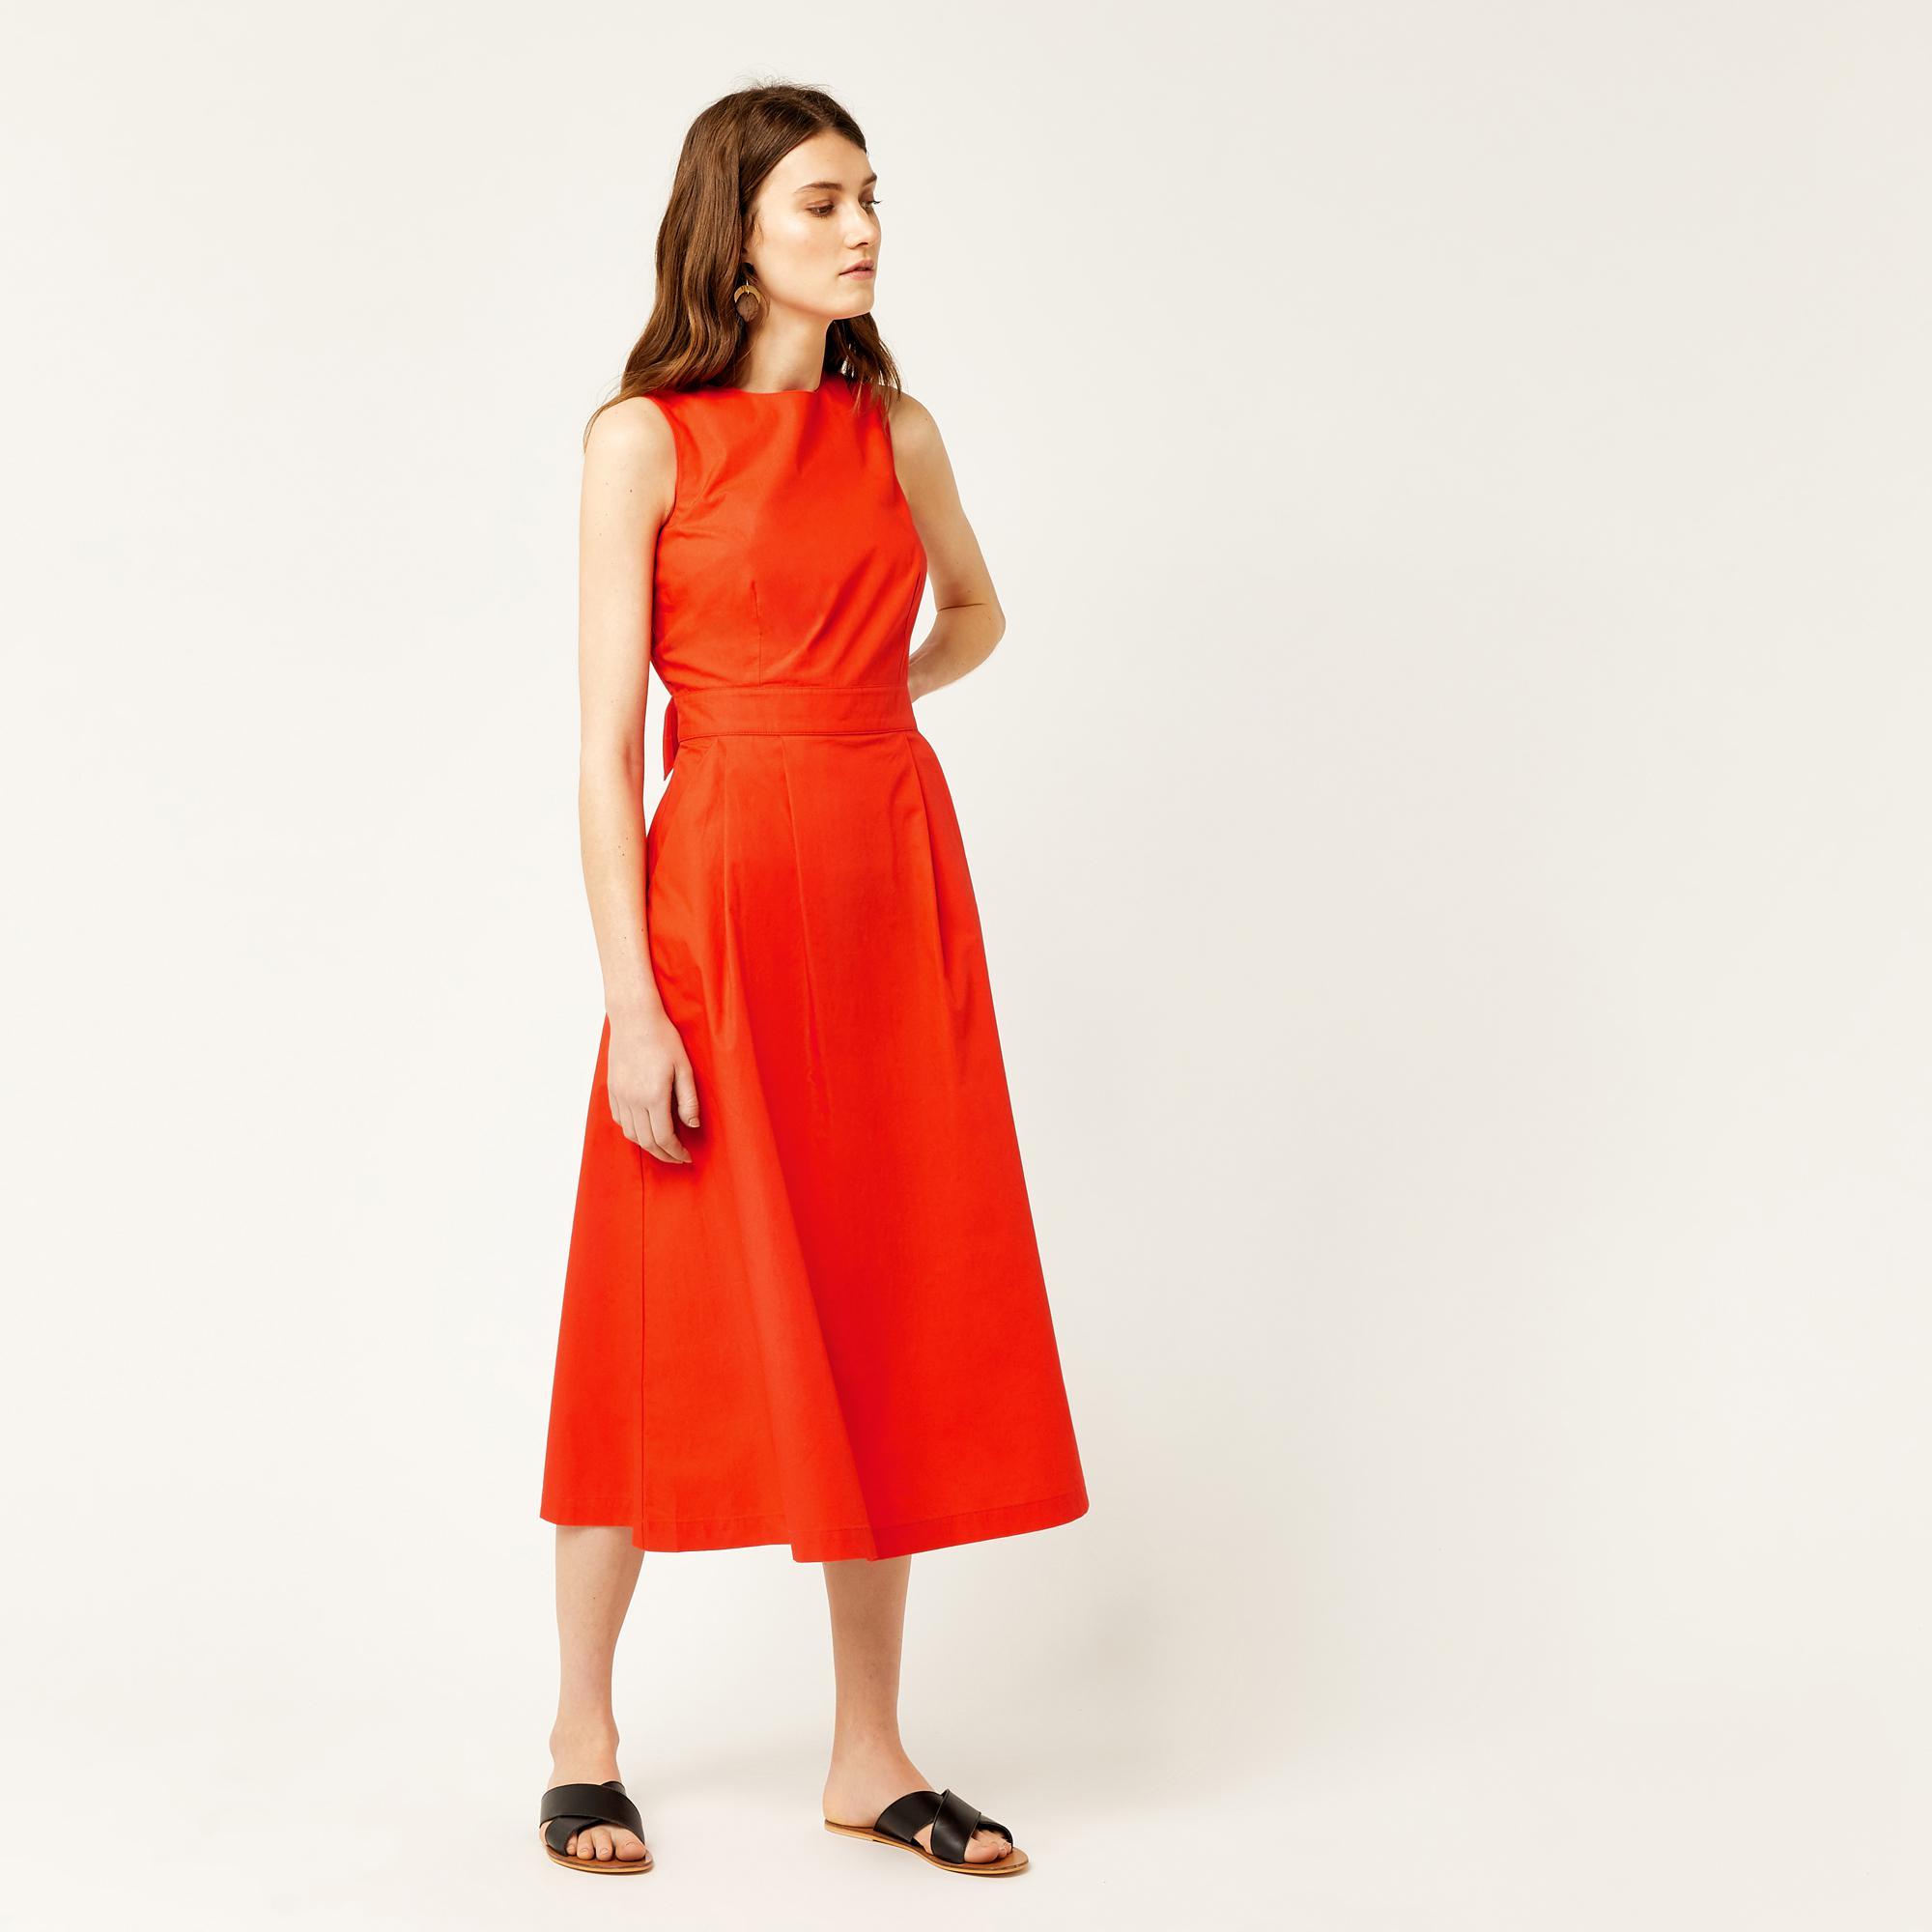 733c72adbed8 Warehouse Cotton Tie Back Midi Dress in Orange - Lyst